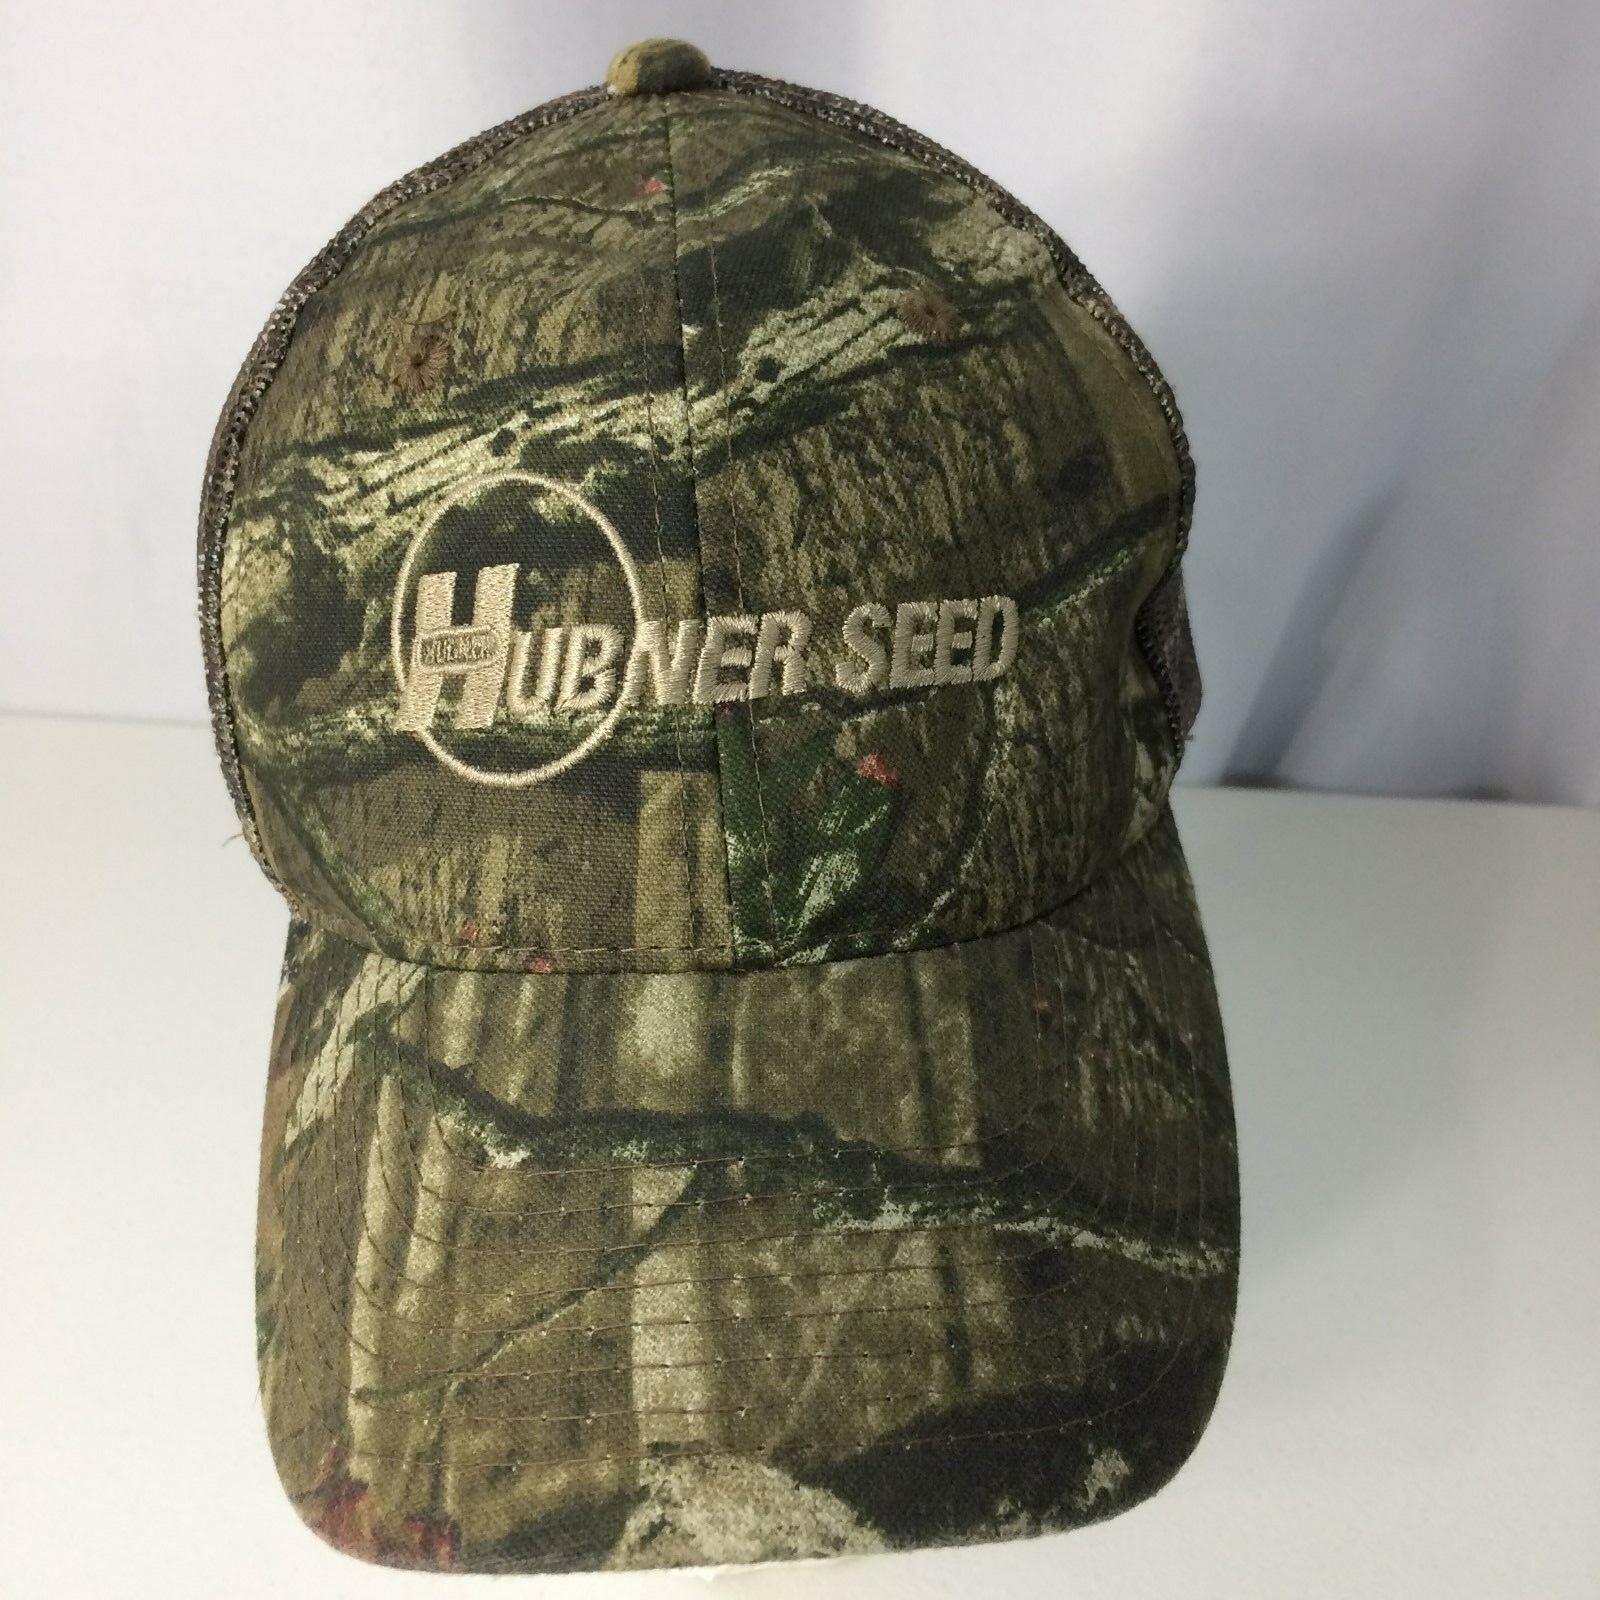 Vintage Green Camouflage Hubner Seed Baseball Green Vintage Cap One Size Fits Most Adjustable 928b6e